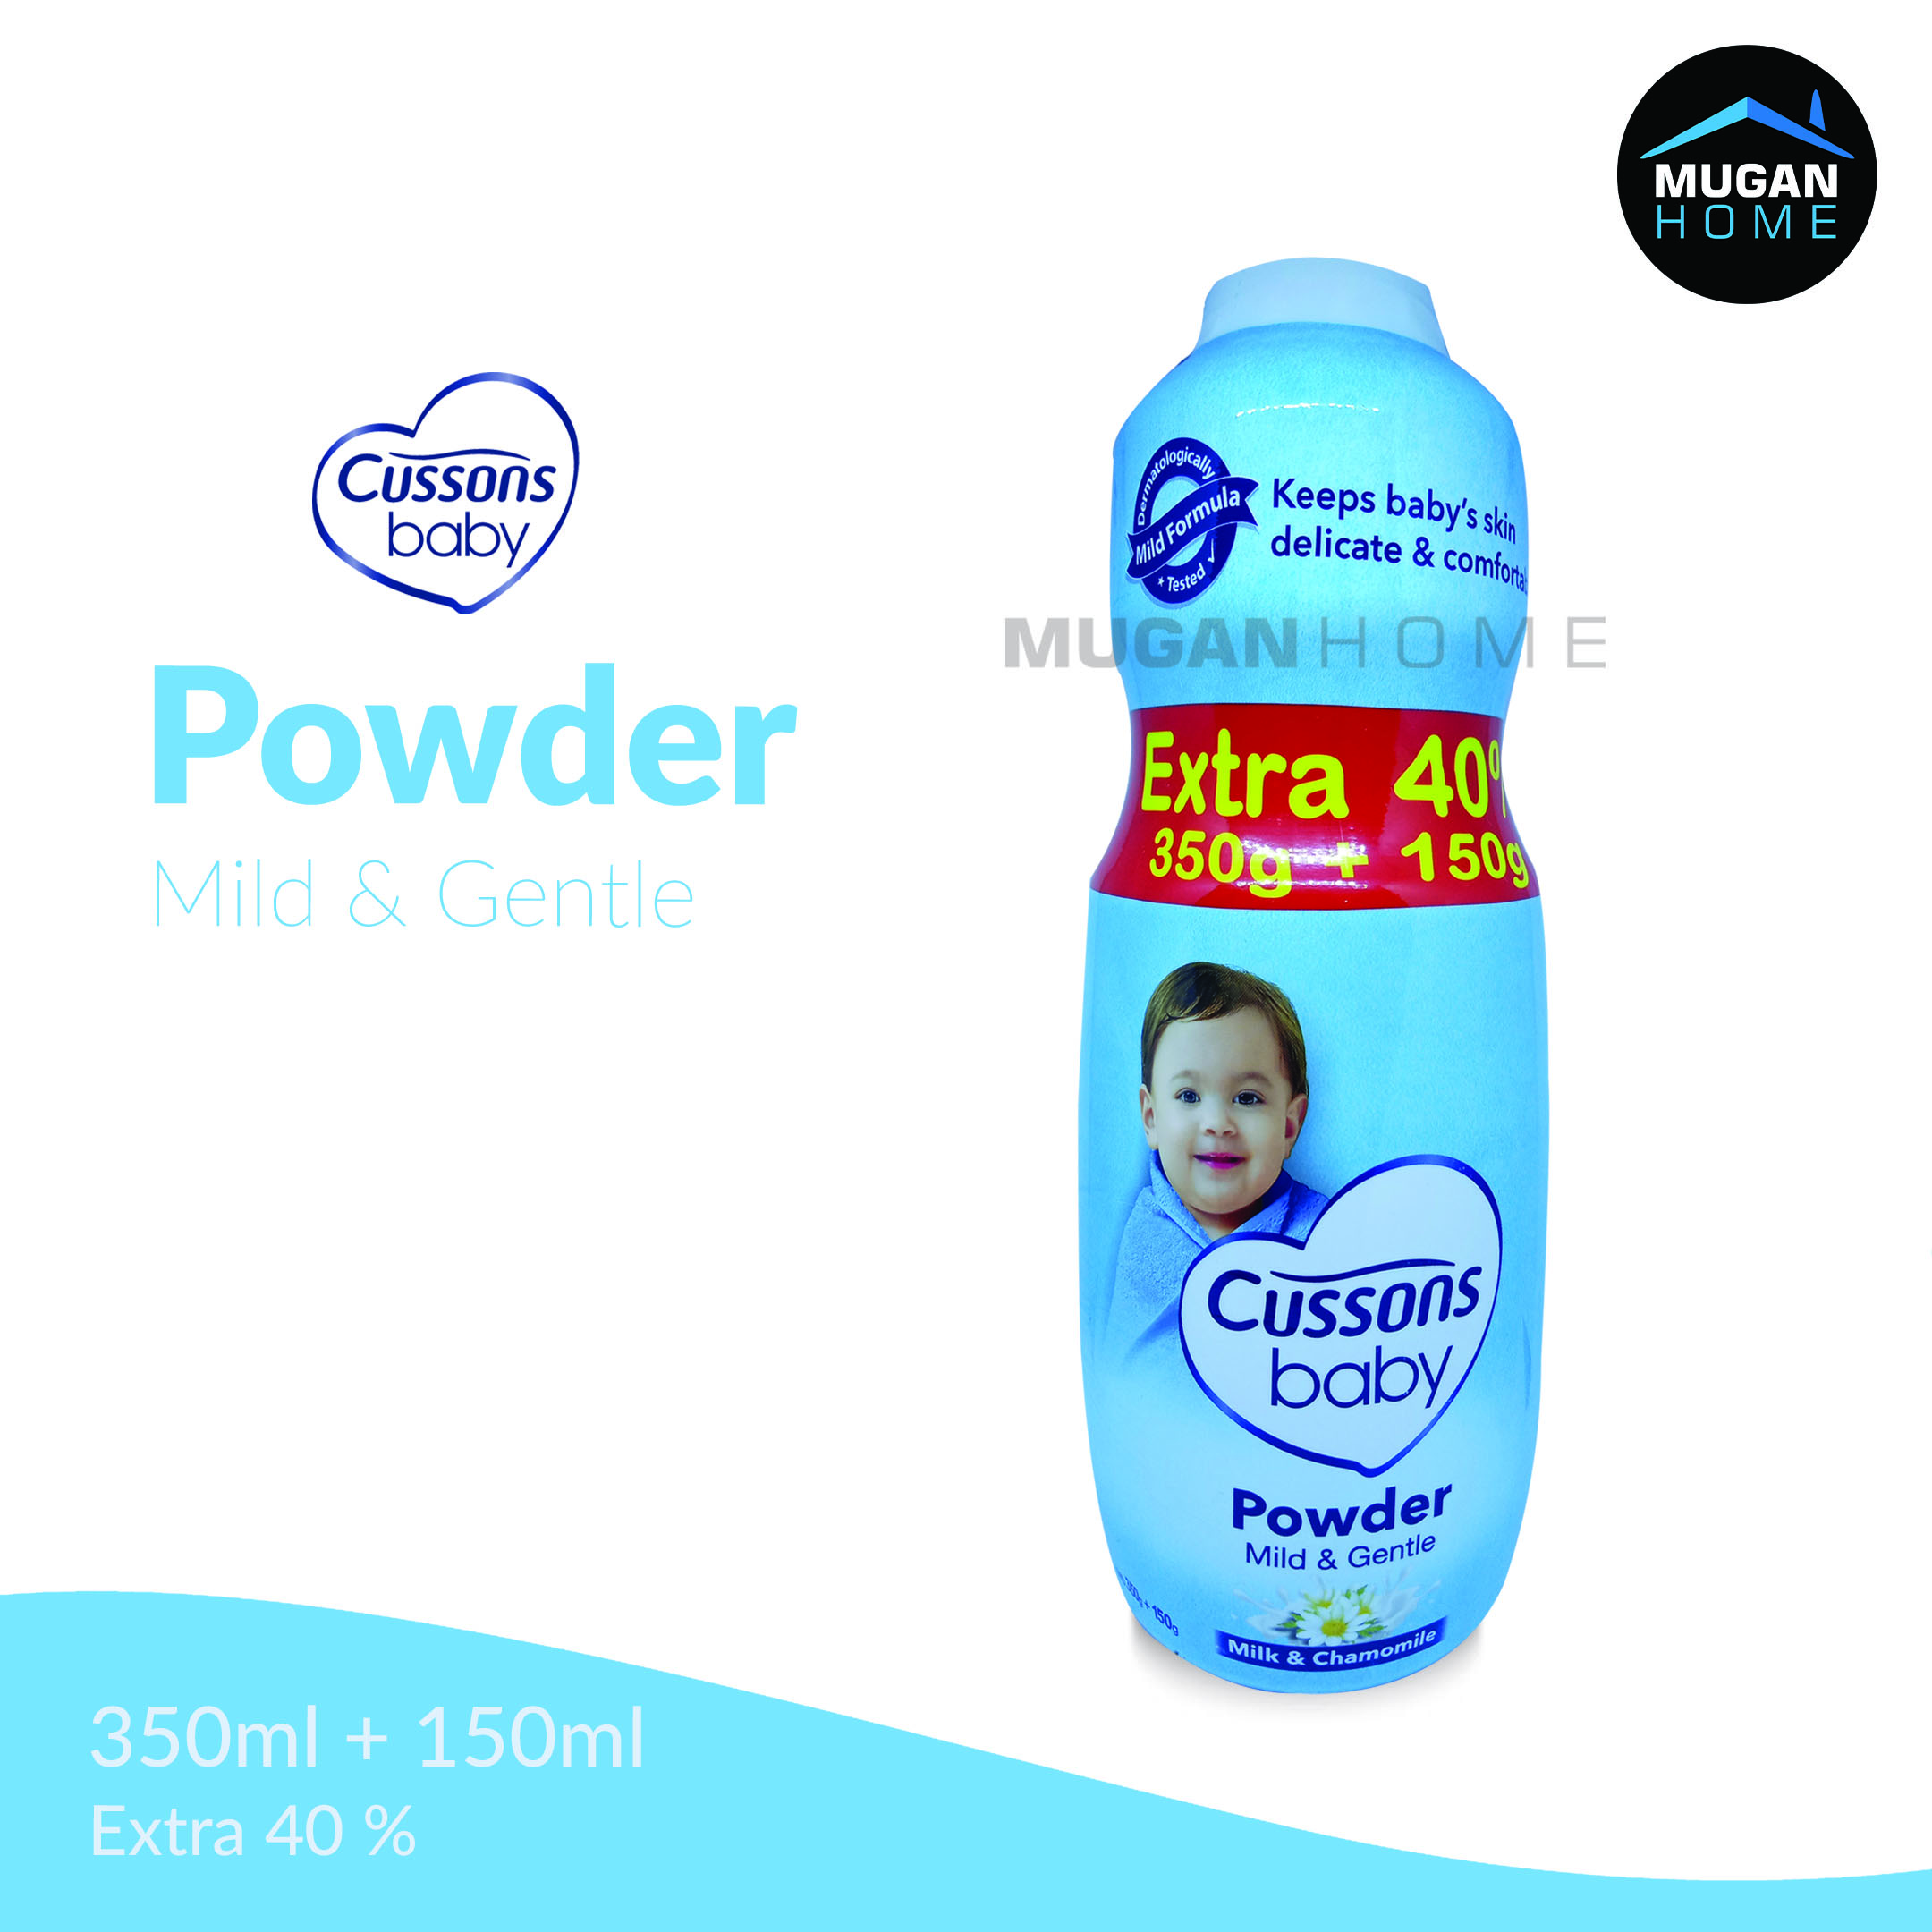 CUSSONS BABY POWDER 350GR MILD & GENTLE EXTRA 40% 150GR